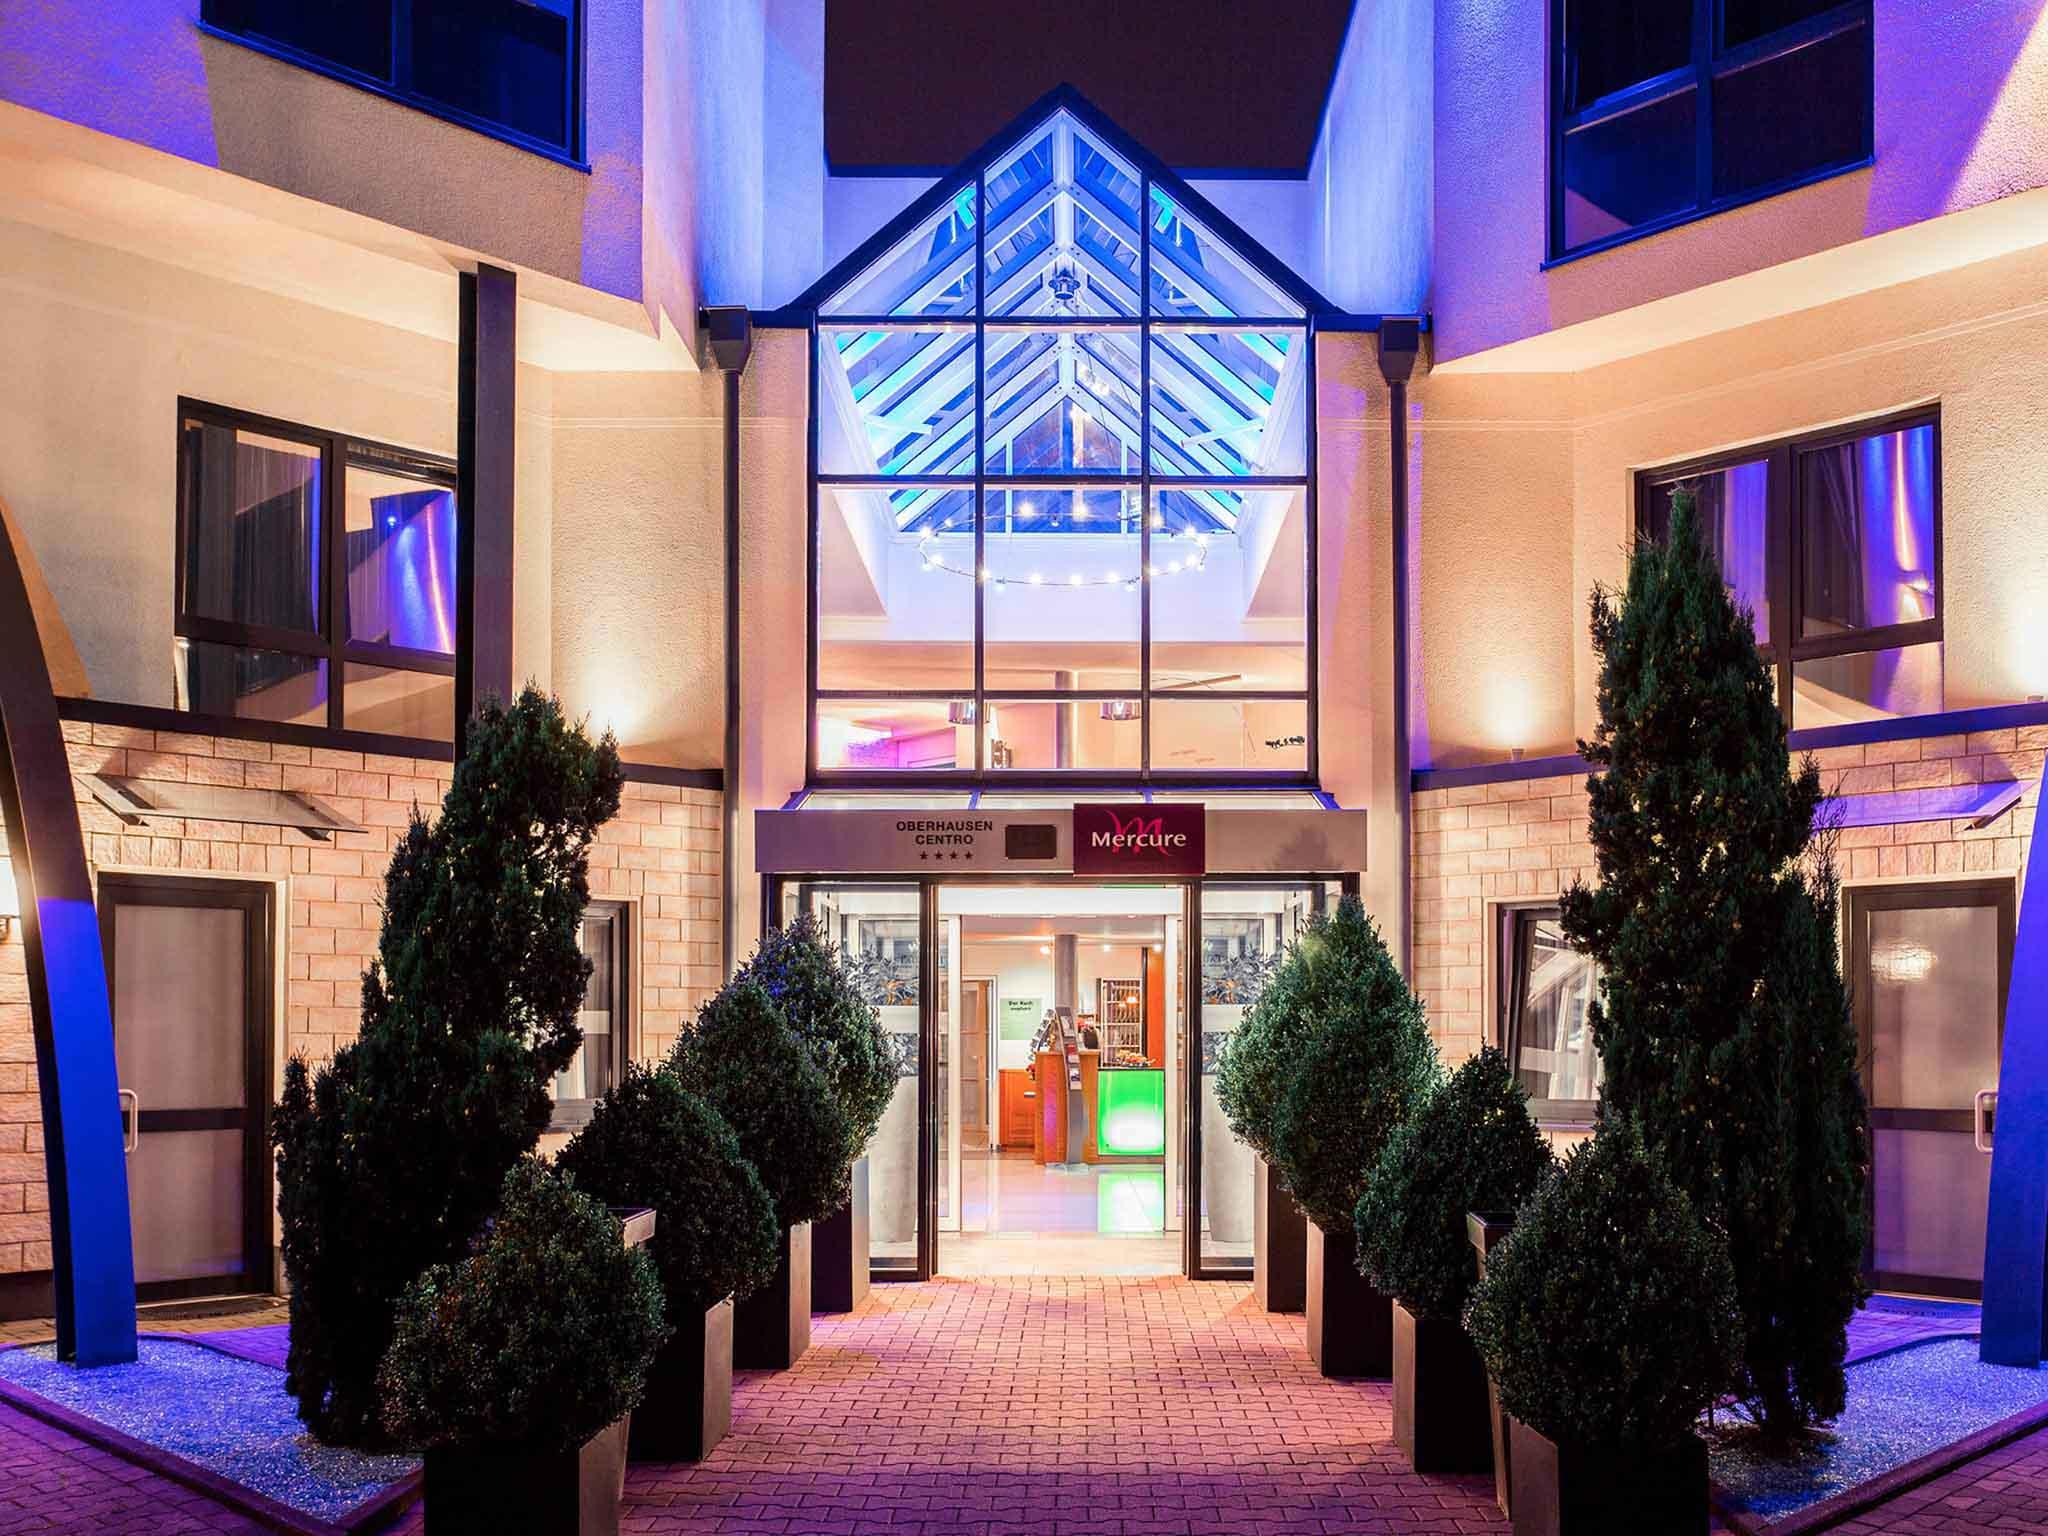 Hotel – Mercure Hotel am Centro Oberhausen